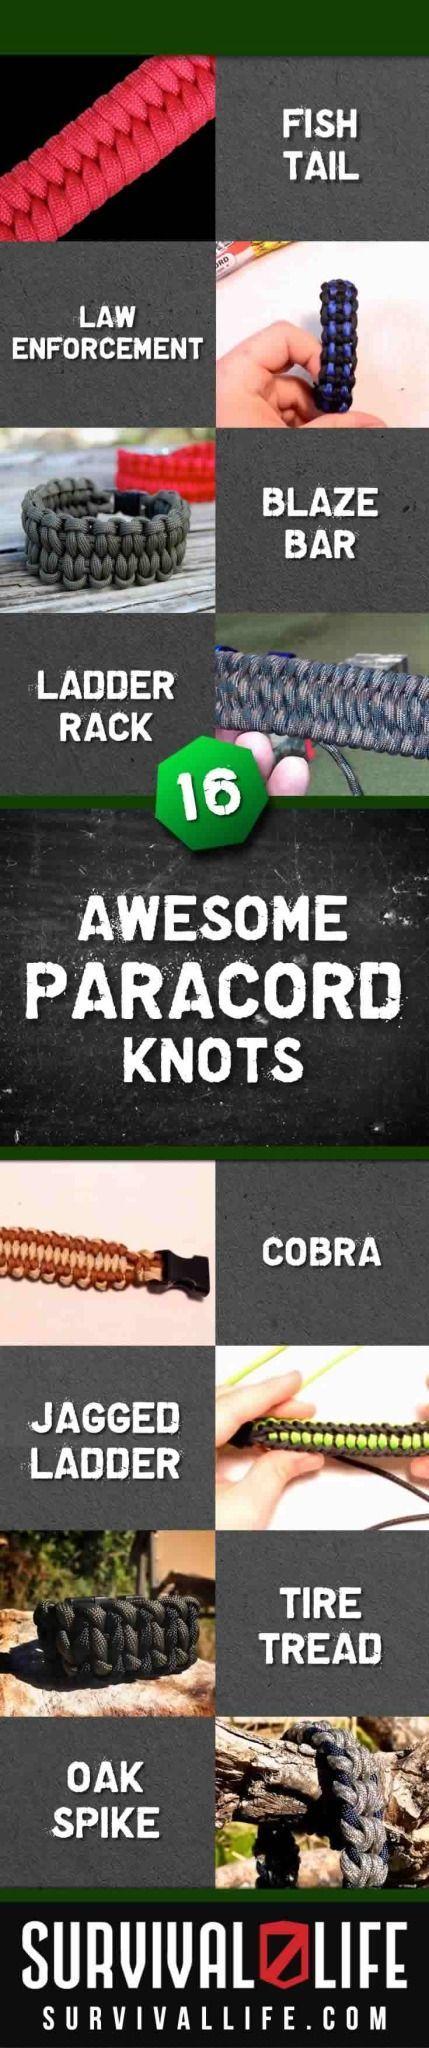 How To Make A Paracord Survival Bracelet | 16 Paracord Projects for Paracord Bracelets | Survival Life - Survival Life | Preppers | Survival Gear